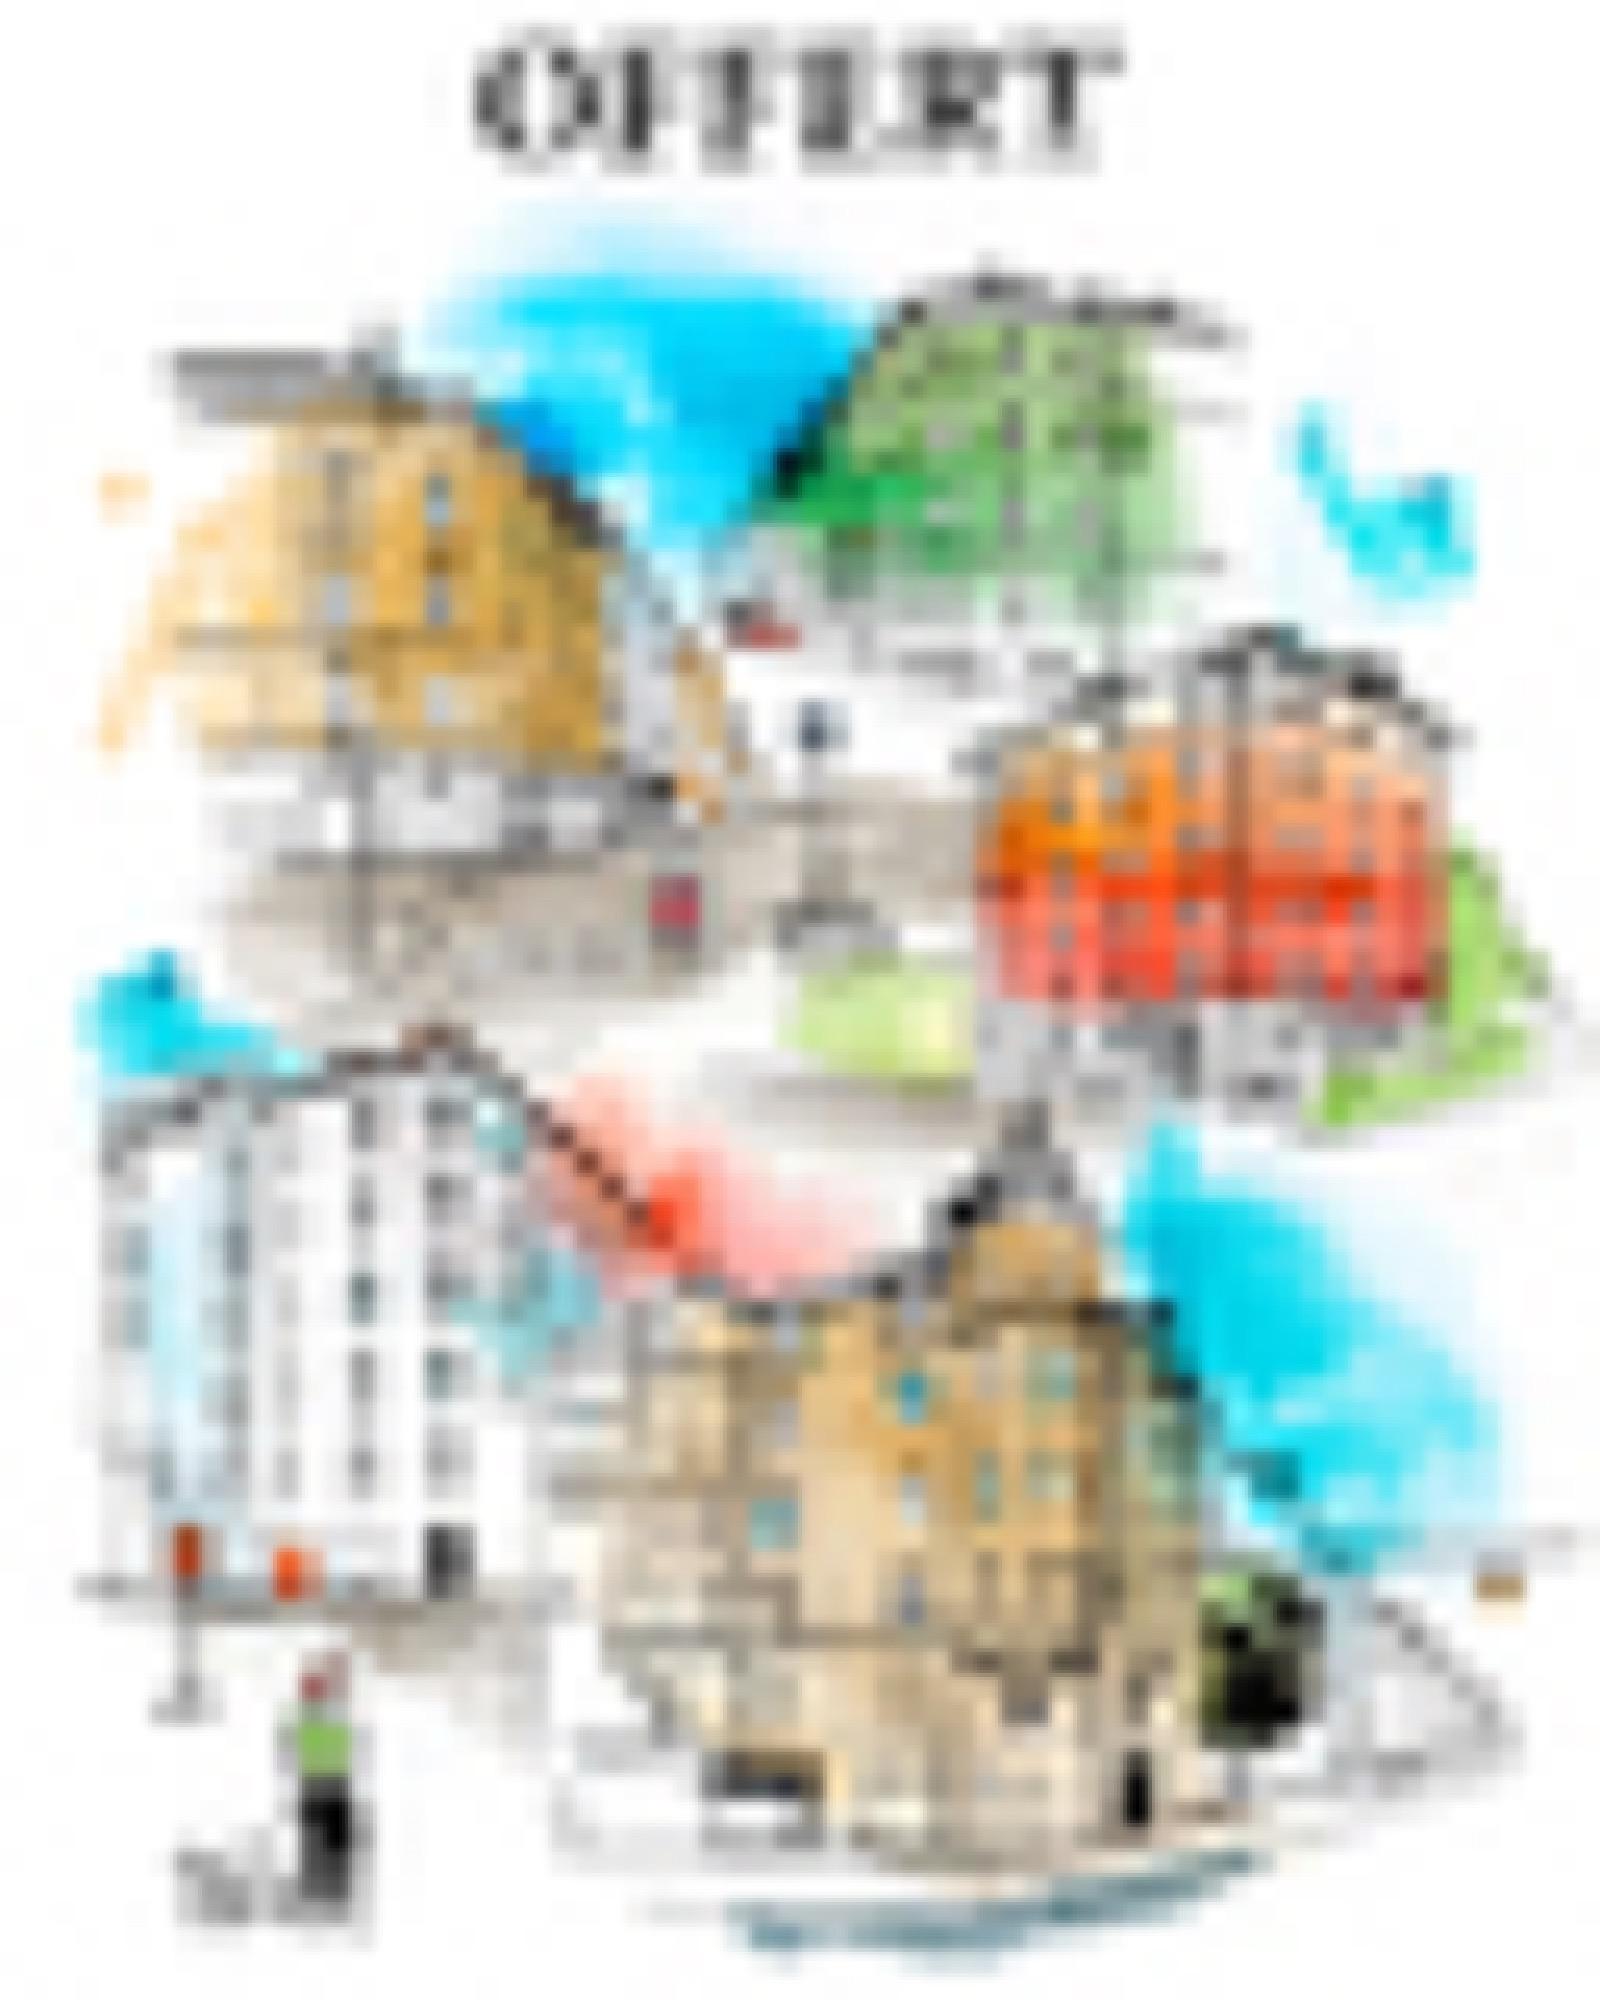 Fjelkners fastighetsförmedling